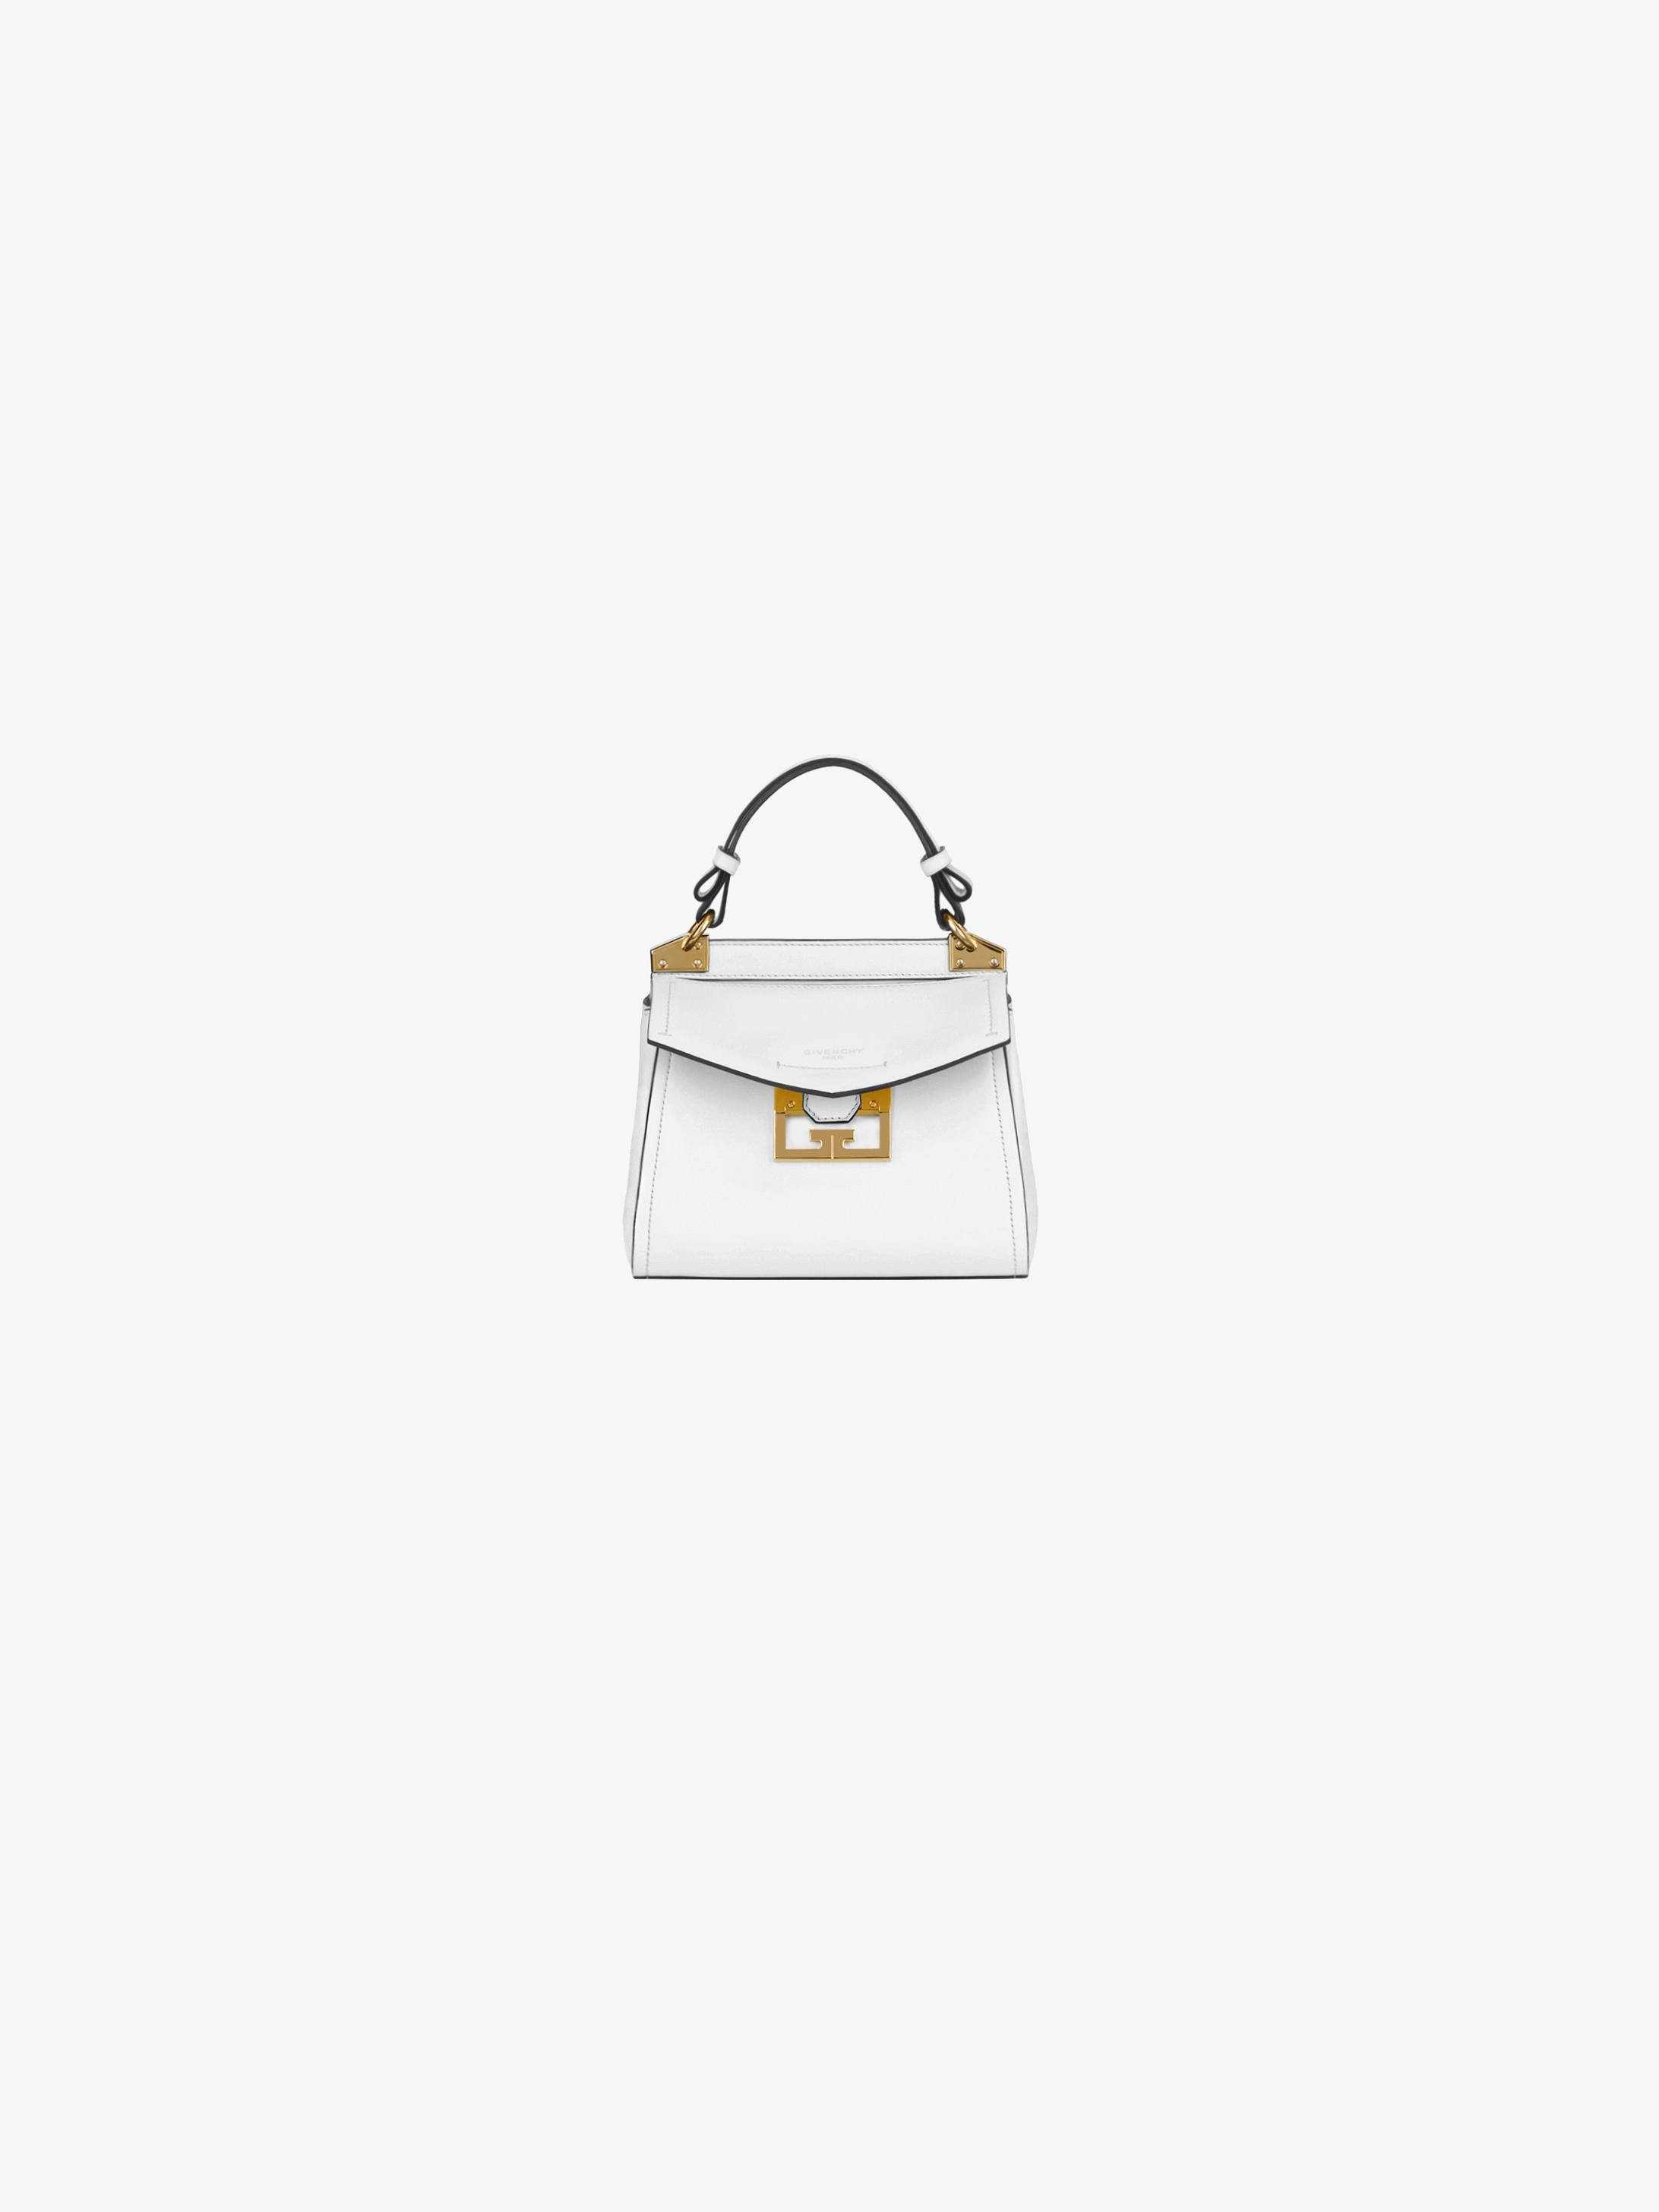 Mini Mystic bag in soft leather